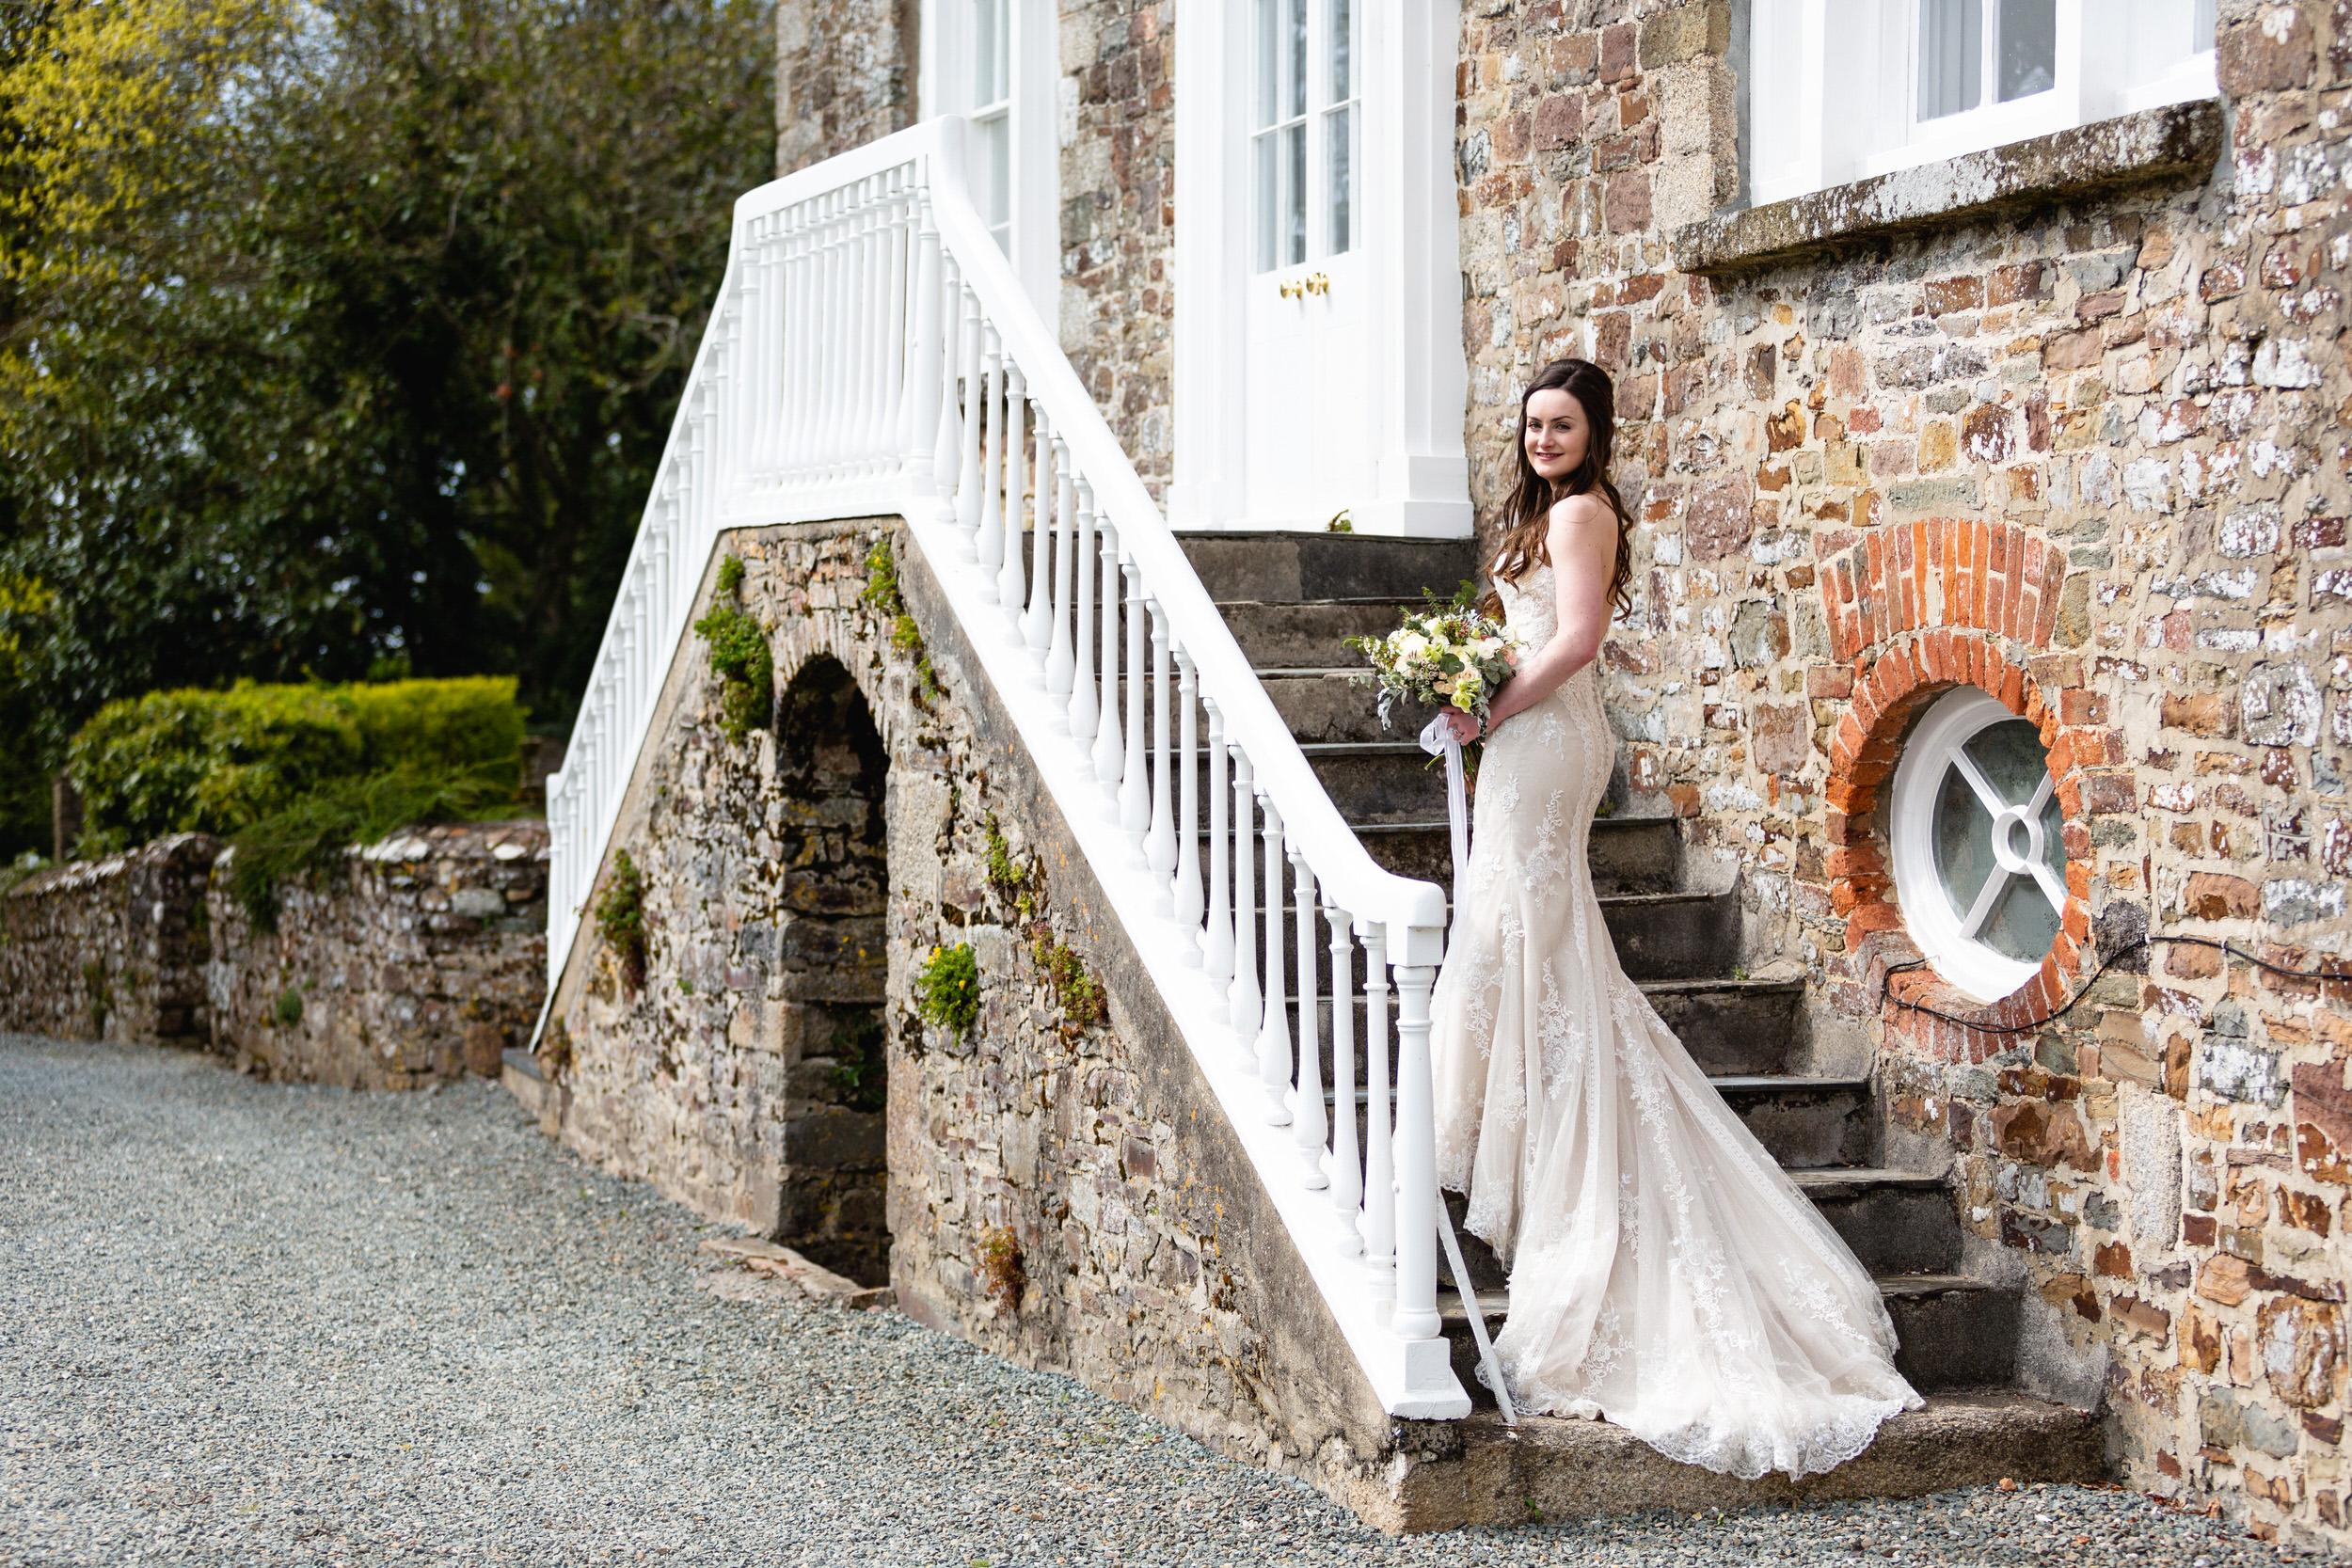 Launcells-Barton-Wedding-Photographer (502).jpg